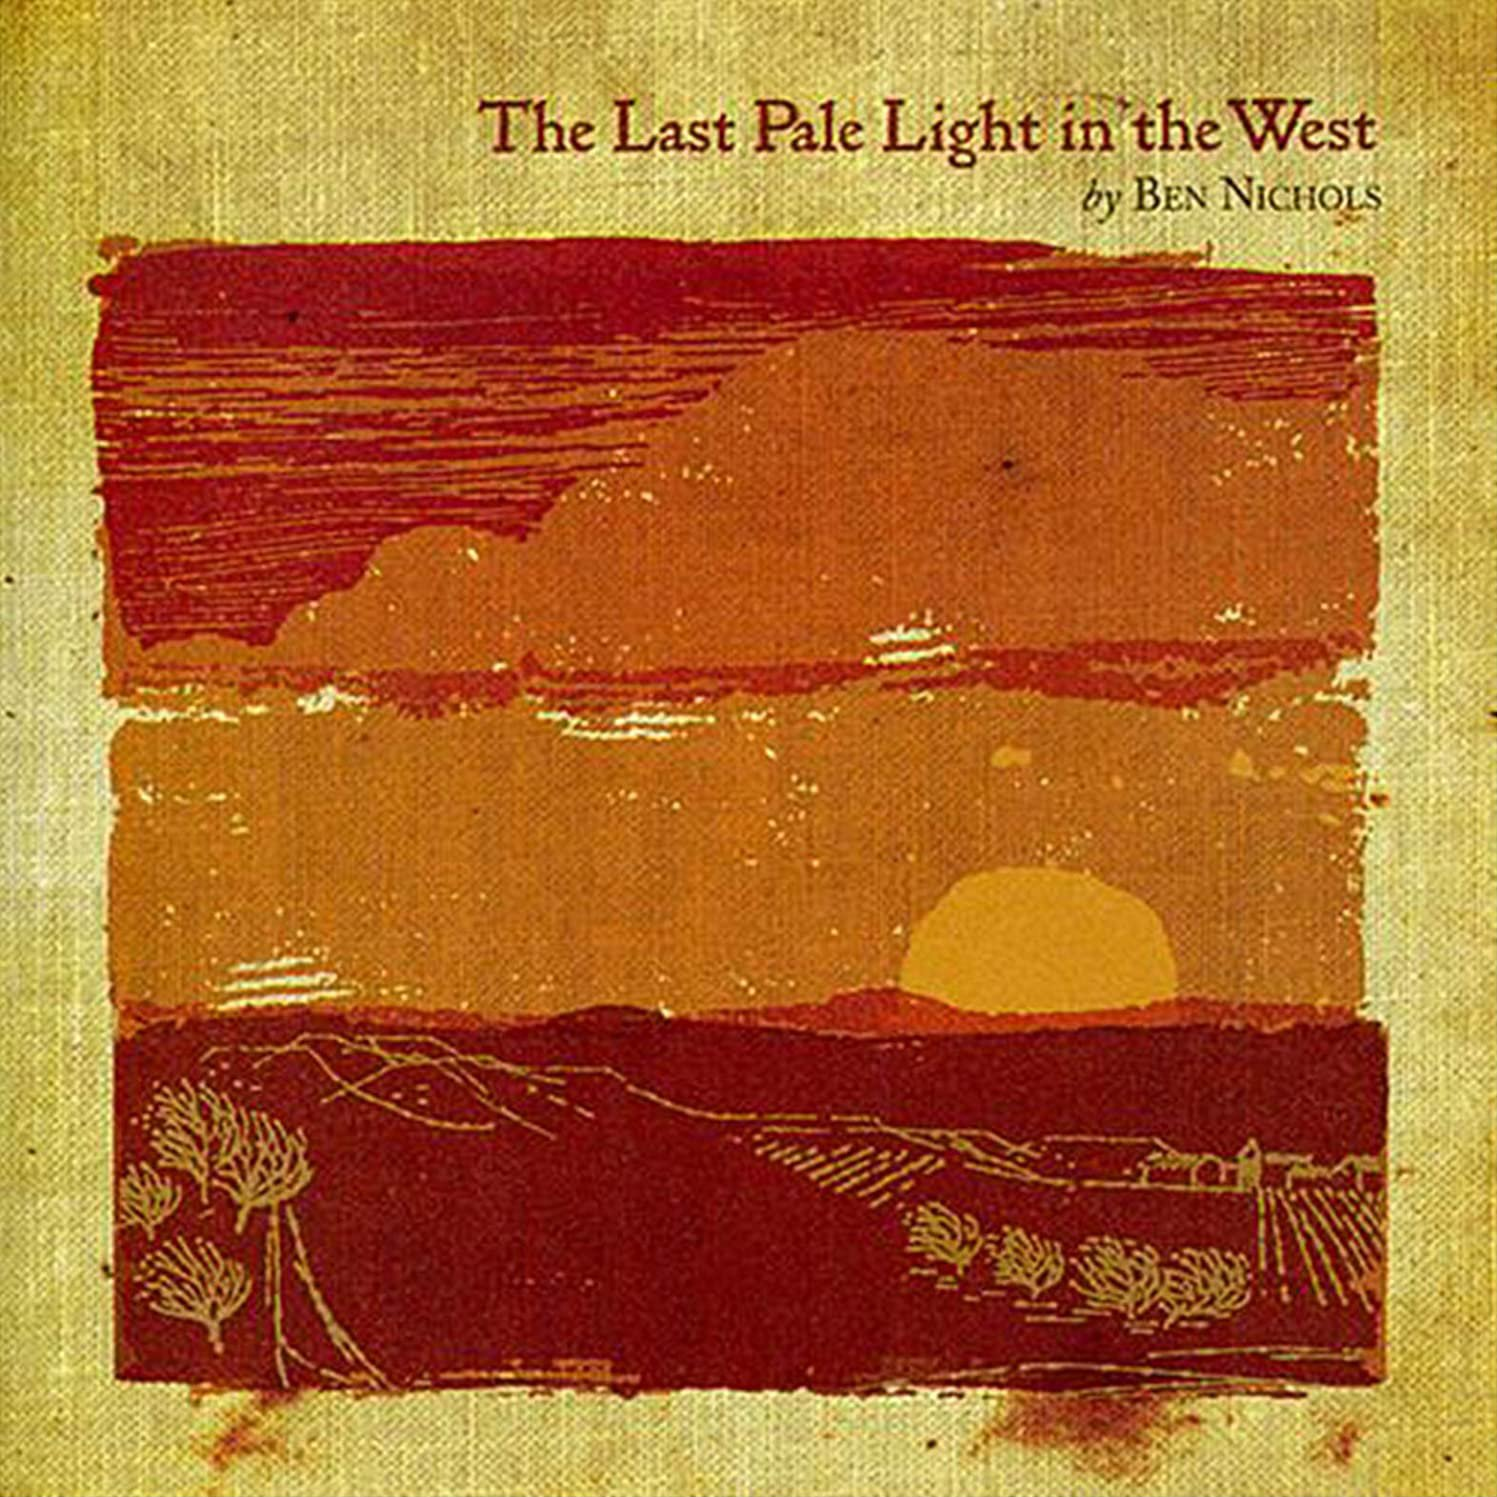 Ben Nichols, The Last Pale Light In the West